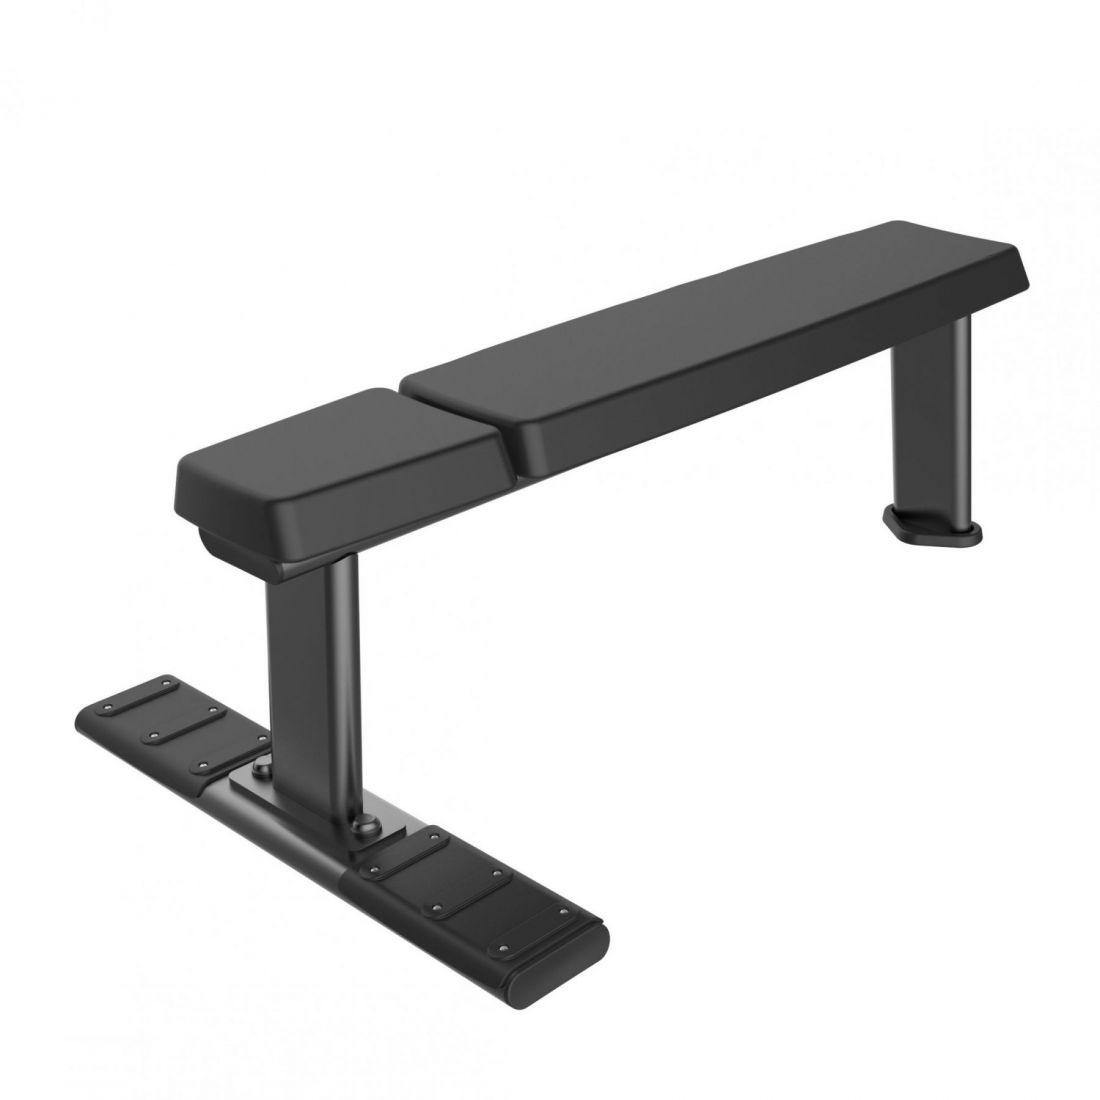 E-7036 Скамья прямая горизонтальная (Flat Bench)